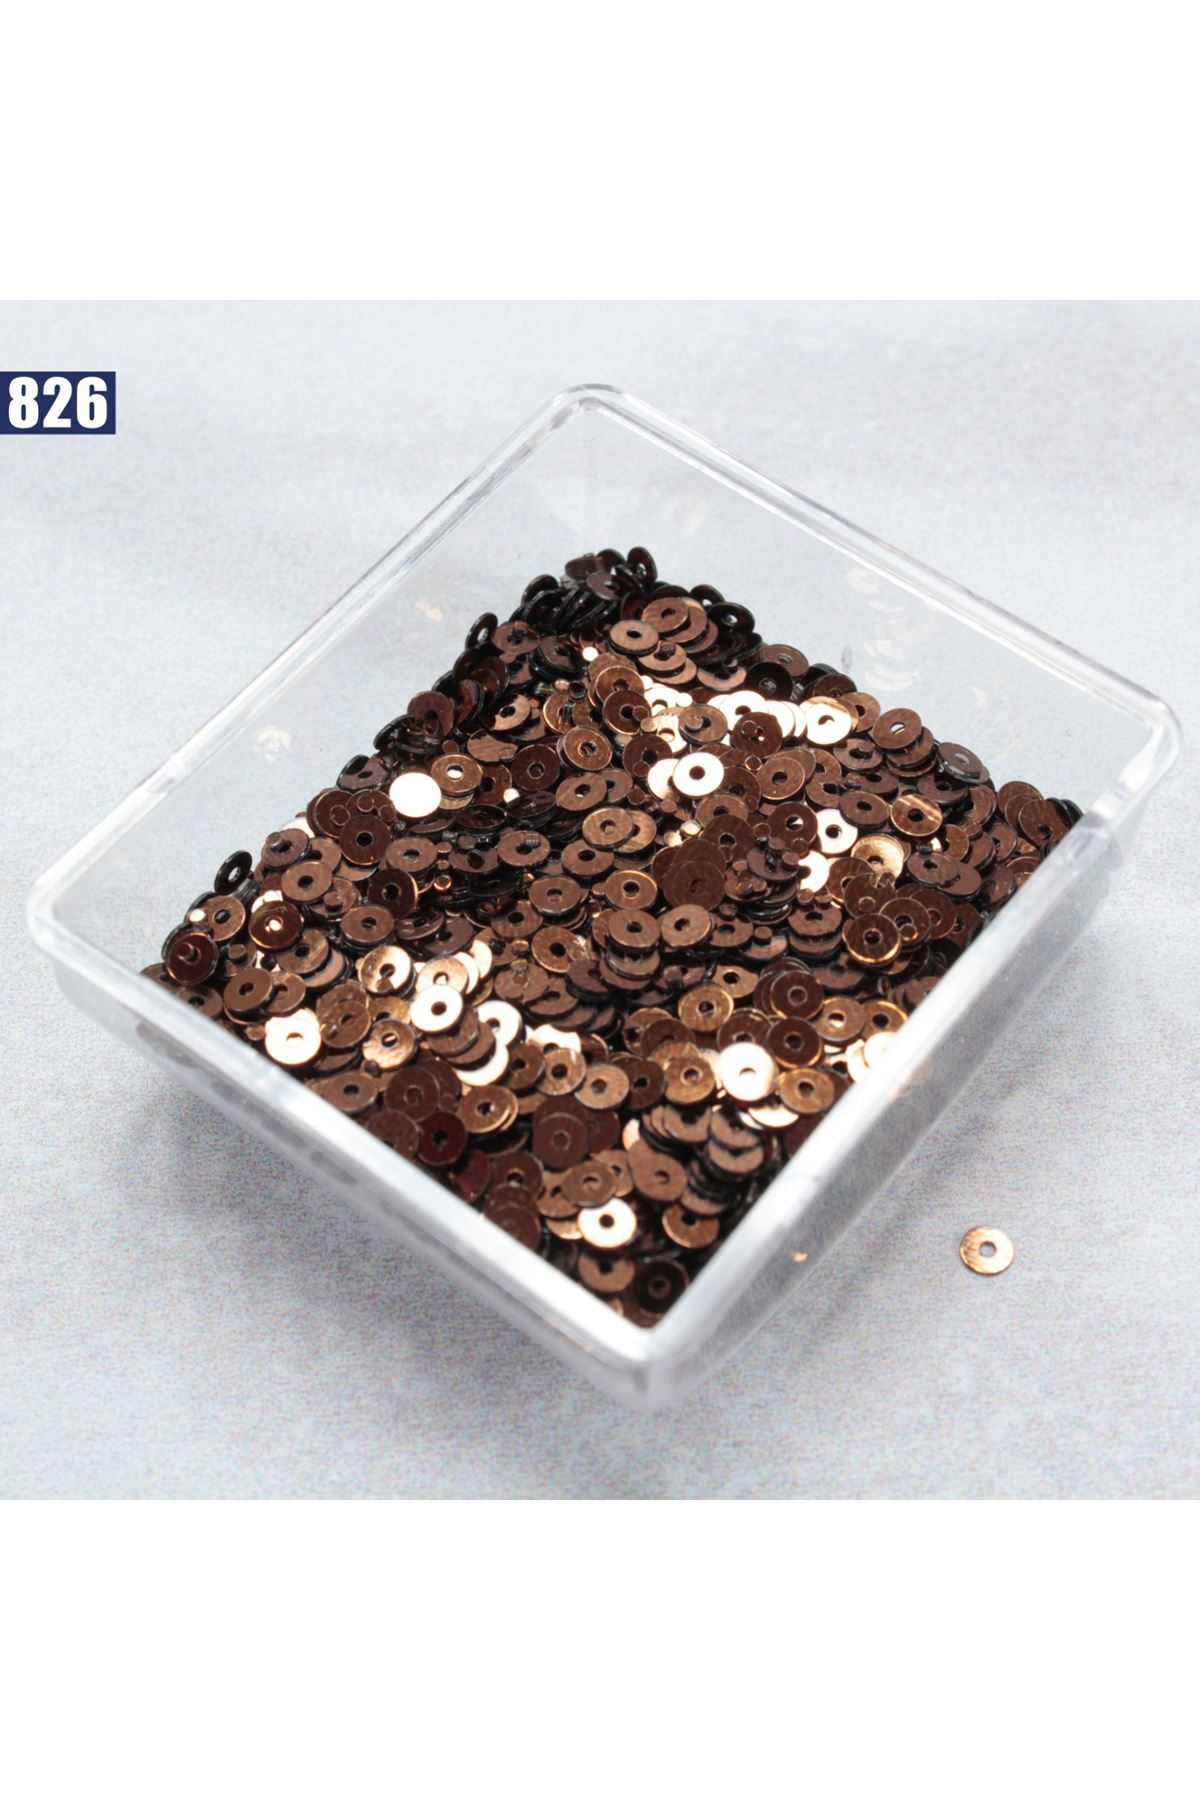 Pul 10 gram - 826